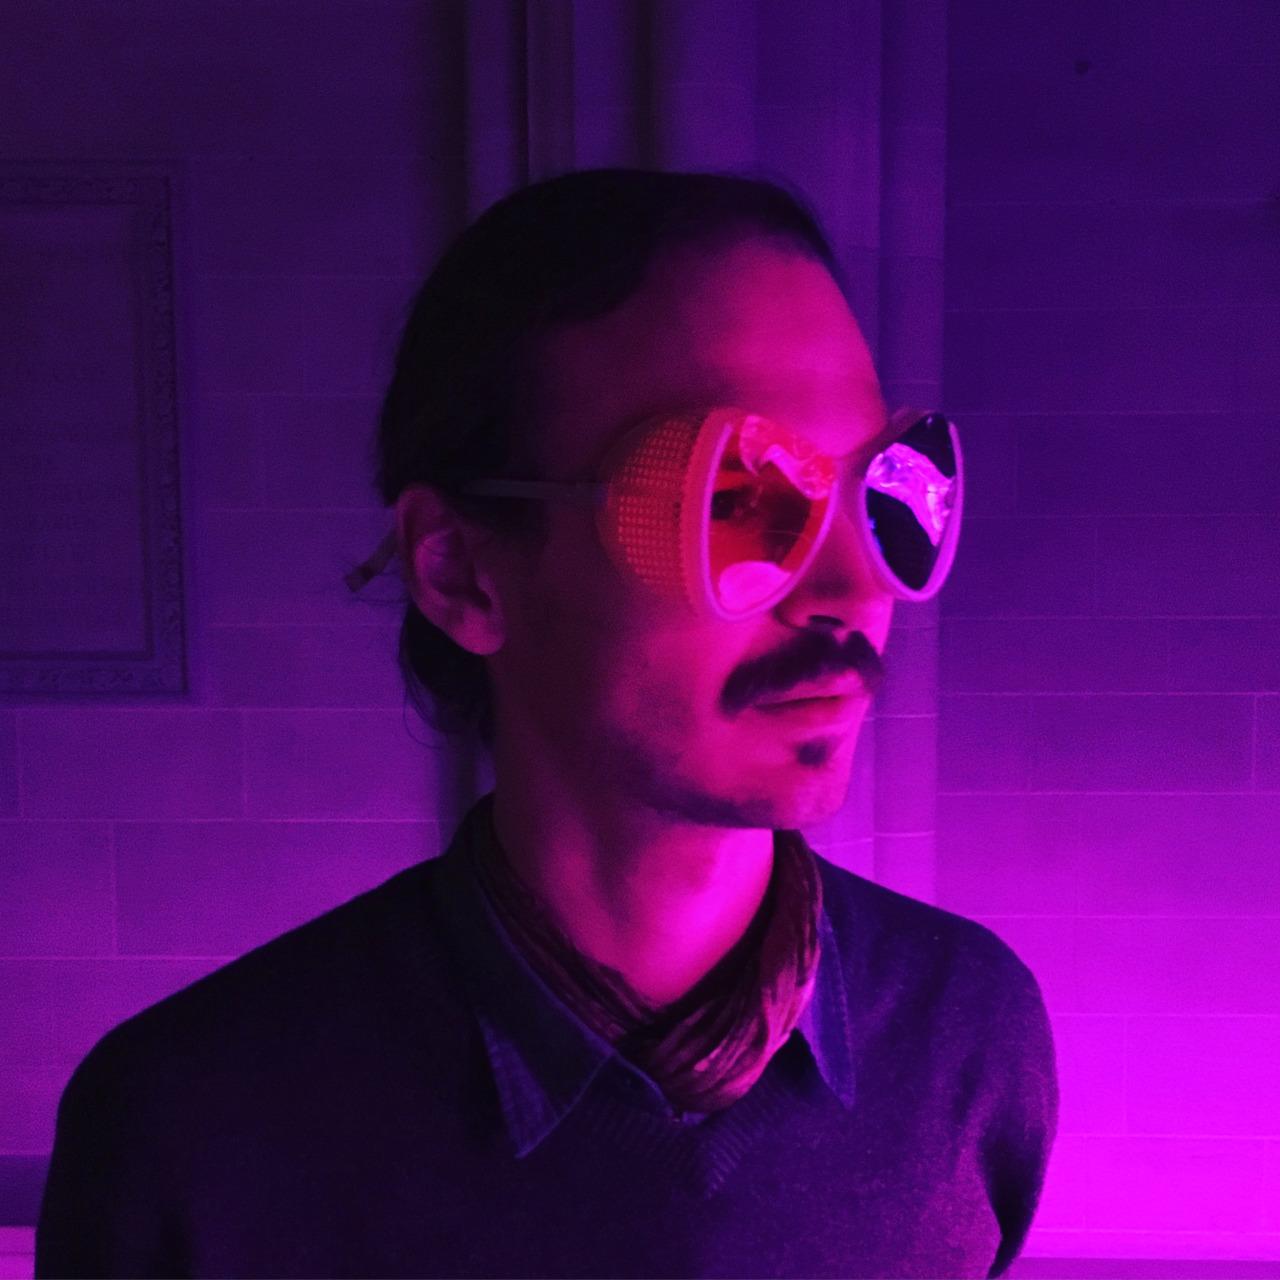 Album Review: Drums of Days (2016) by Flin van Hemmen